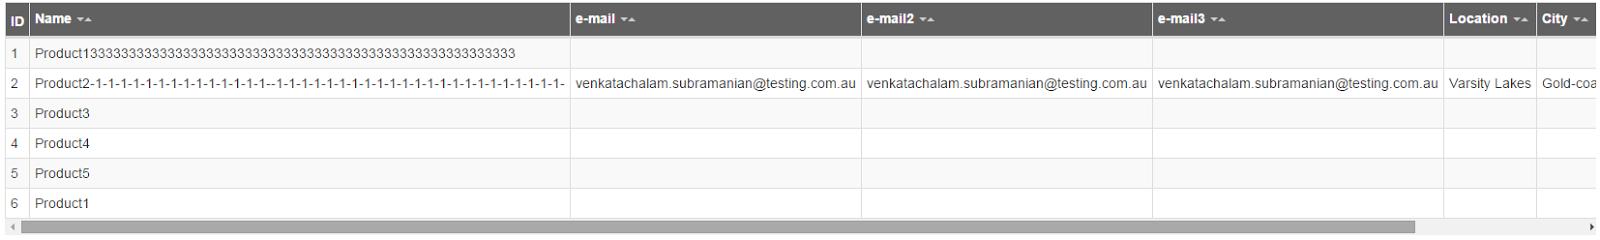 Venkat$ echo: react-bootstrap-table | header column alignment fix